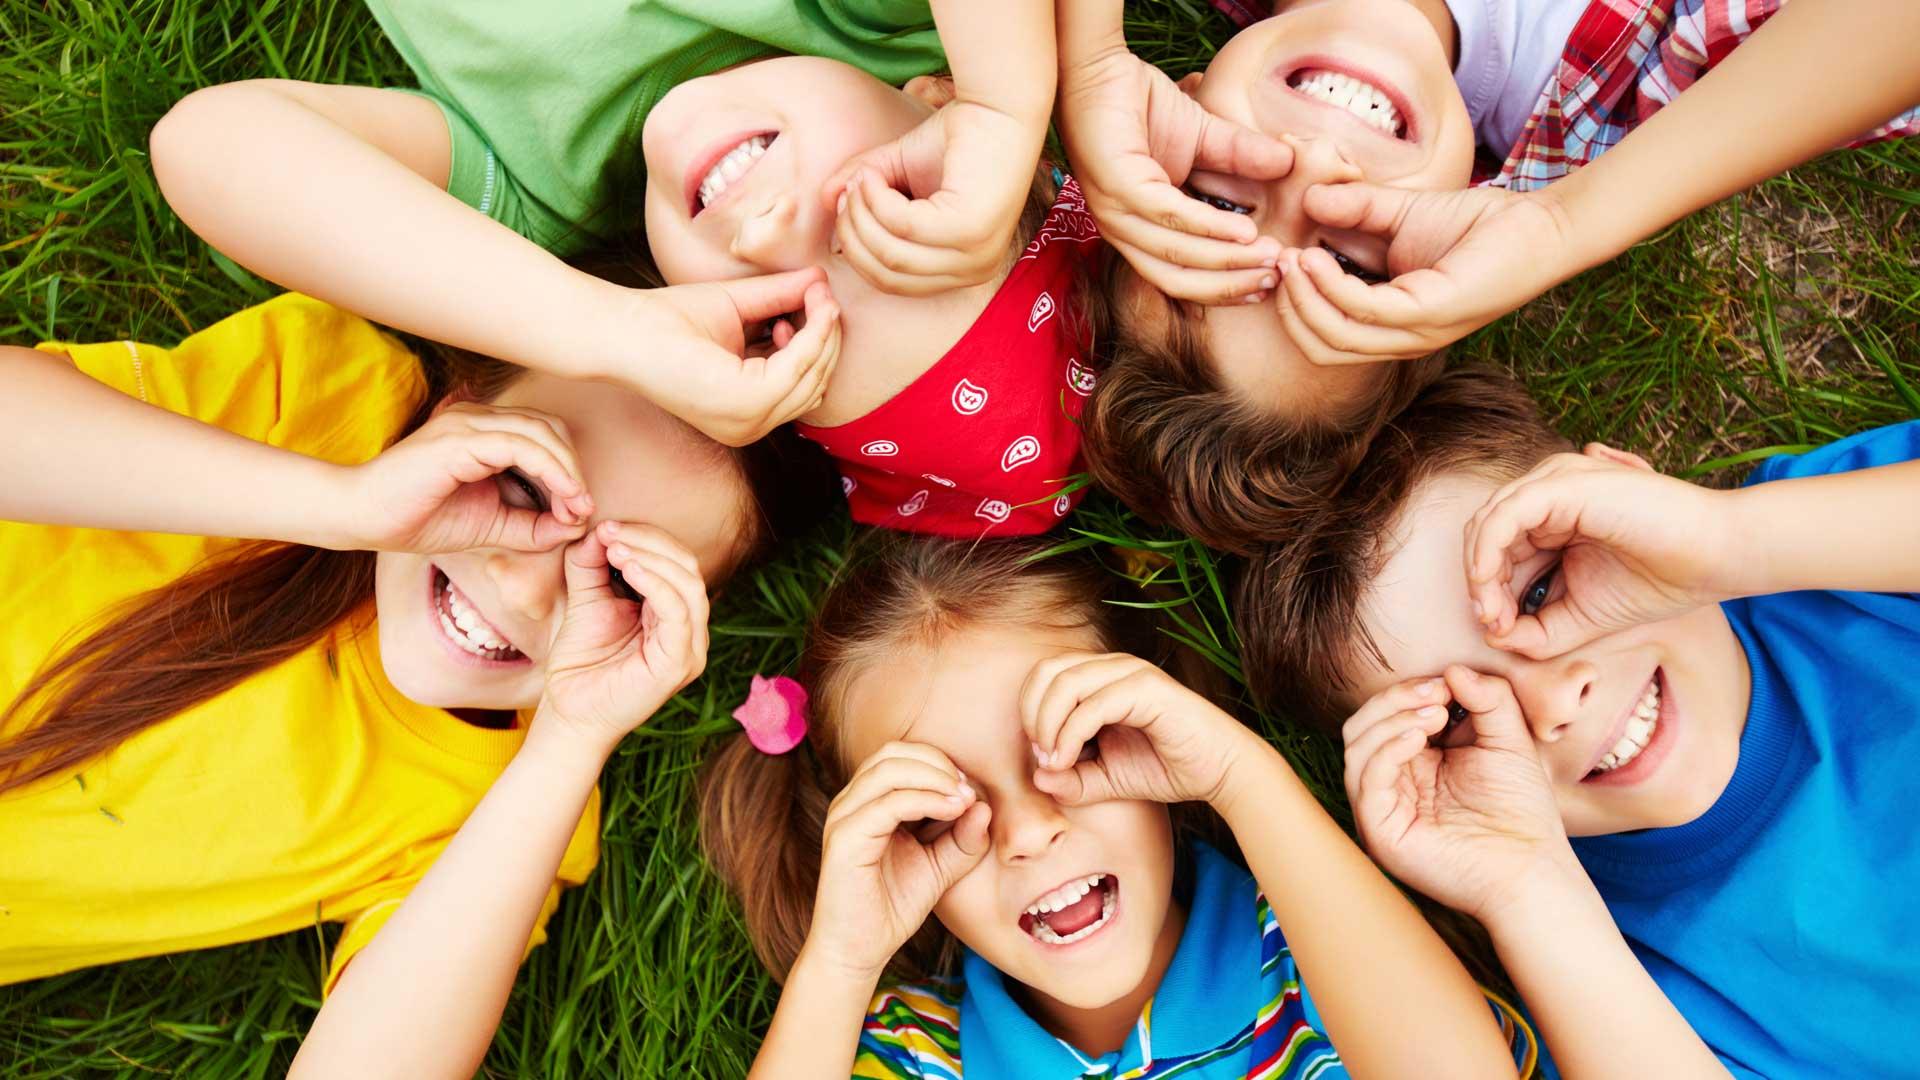 Children-playing-on-grass.jpg